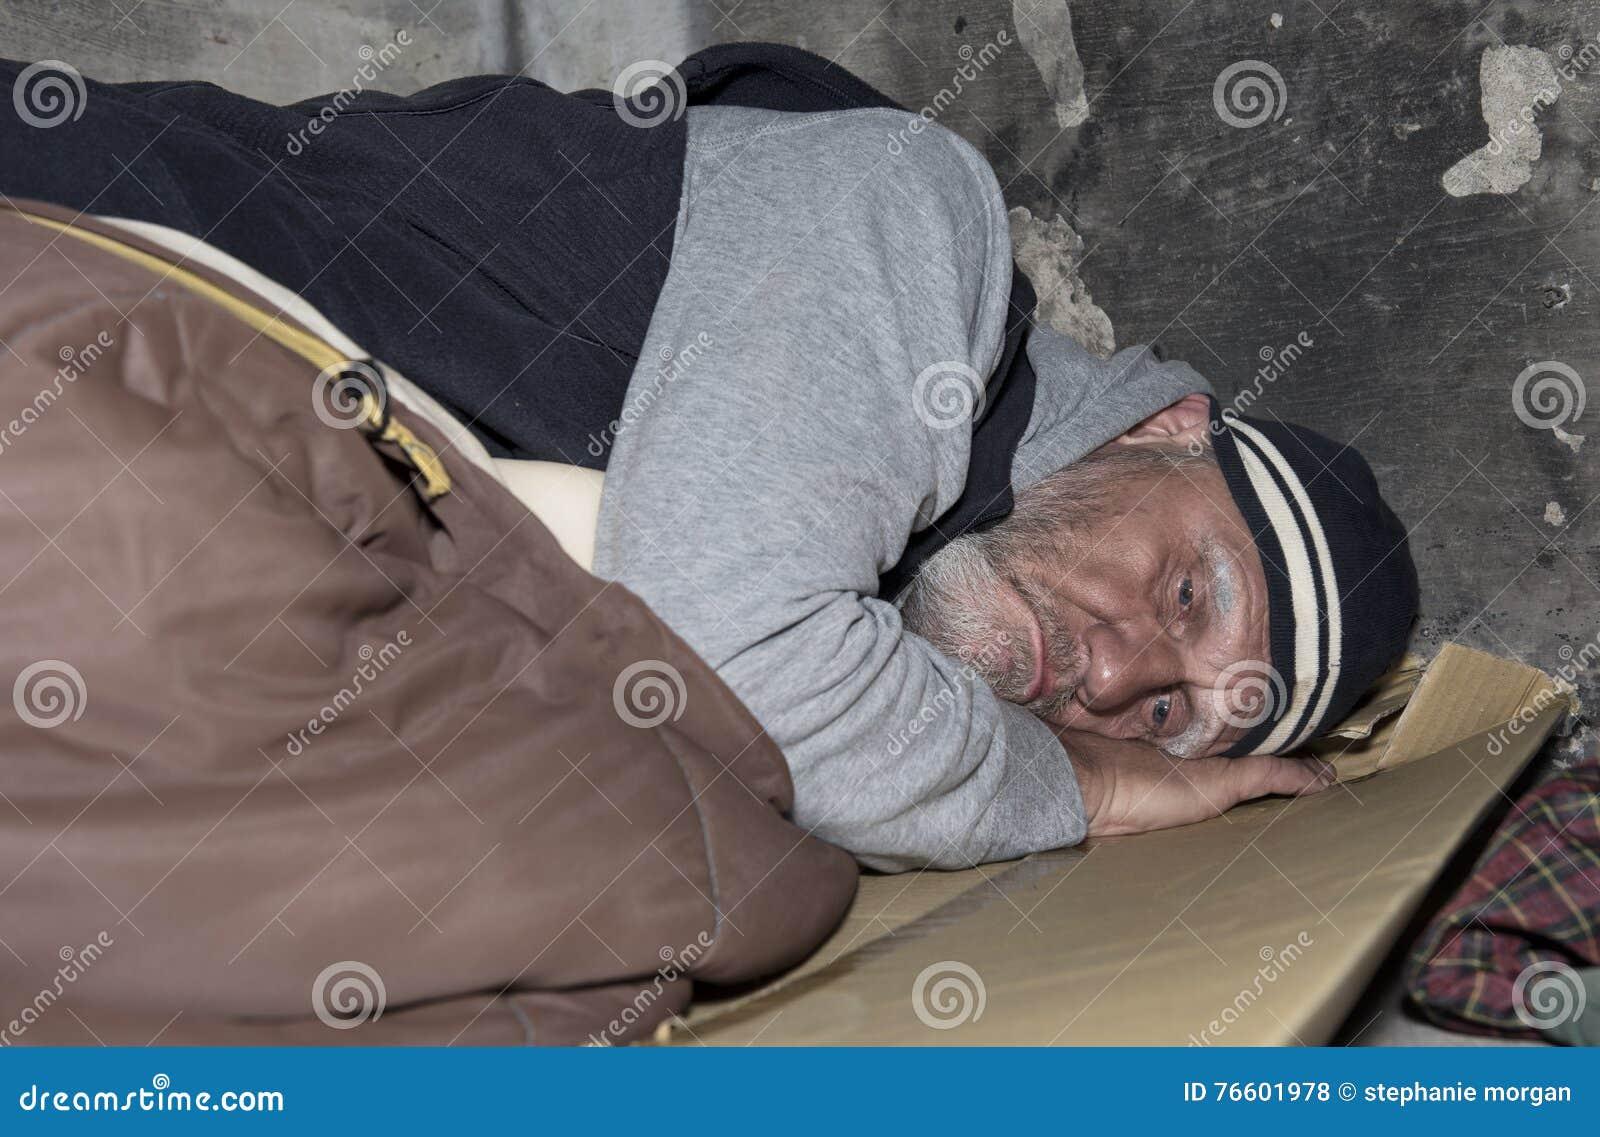 Homeless man sleeping on cardboard and an old sleeping bag o